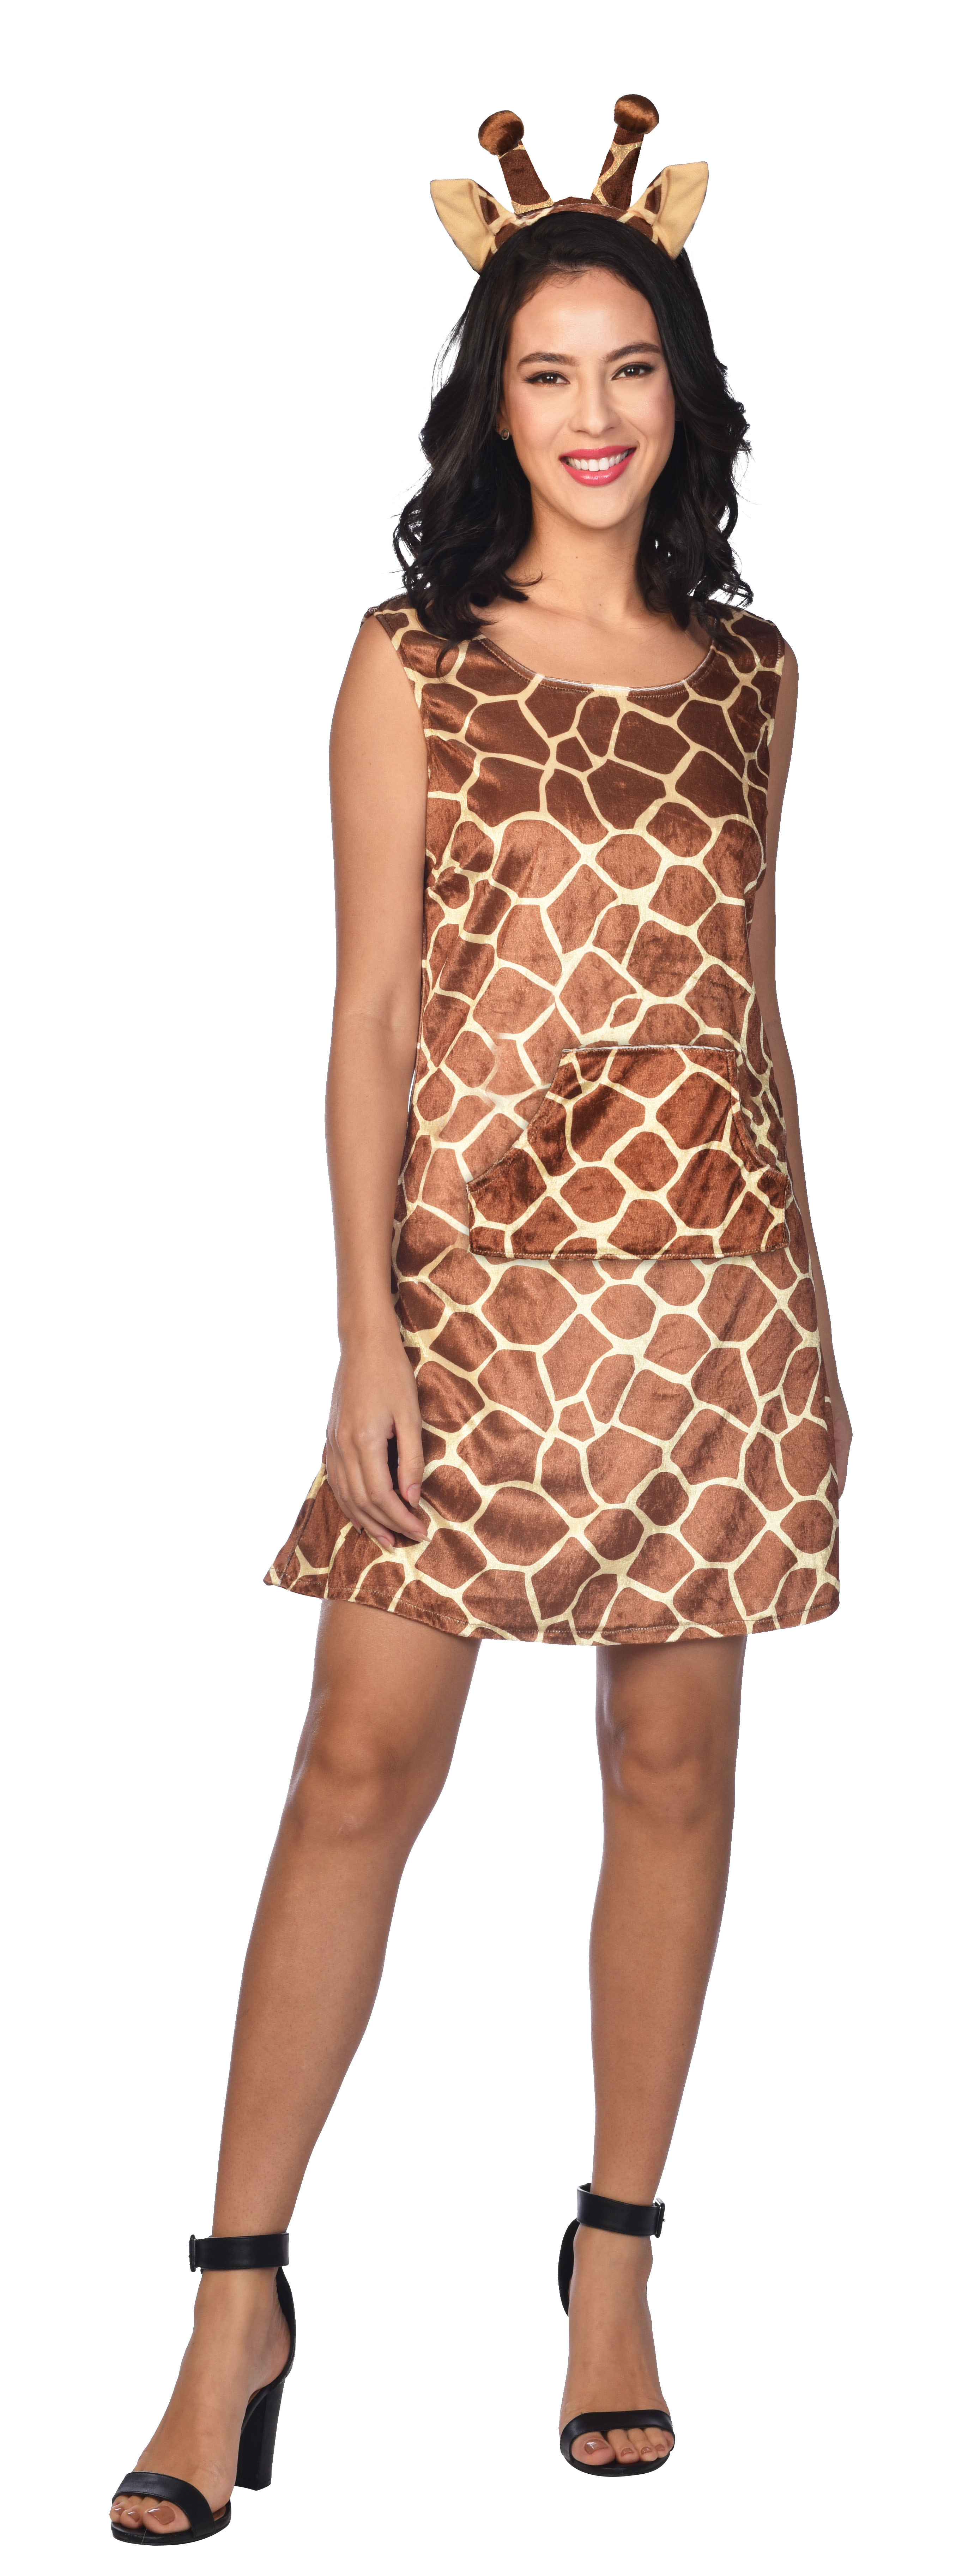 Indexbild 7 - Adult Ladies Zoo Safari Animal Giraffe Lady Fancy Dress Costume Womens Outfit